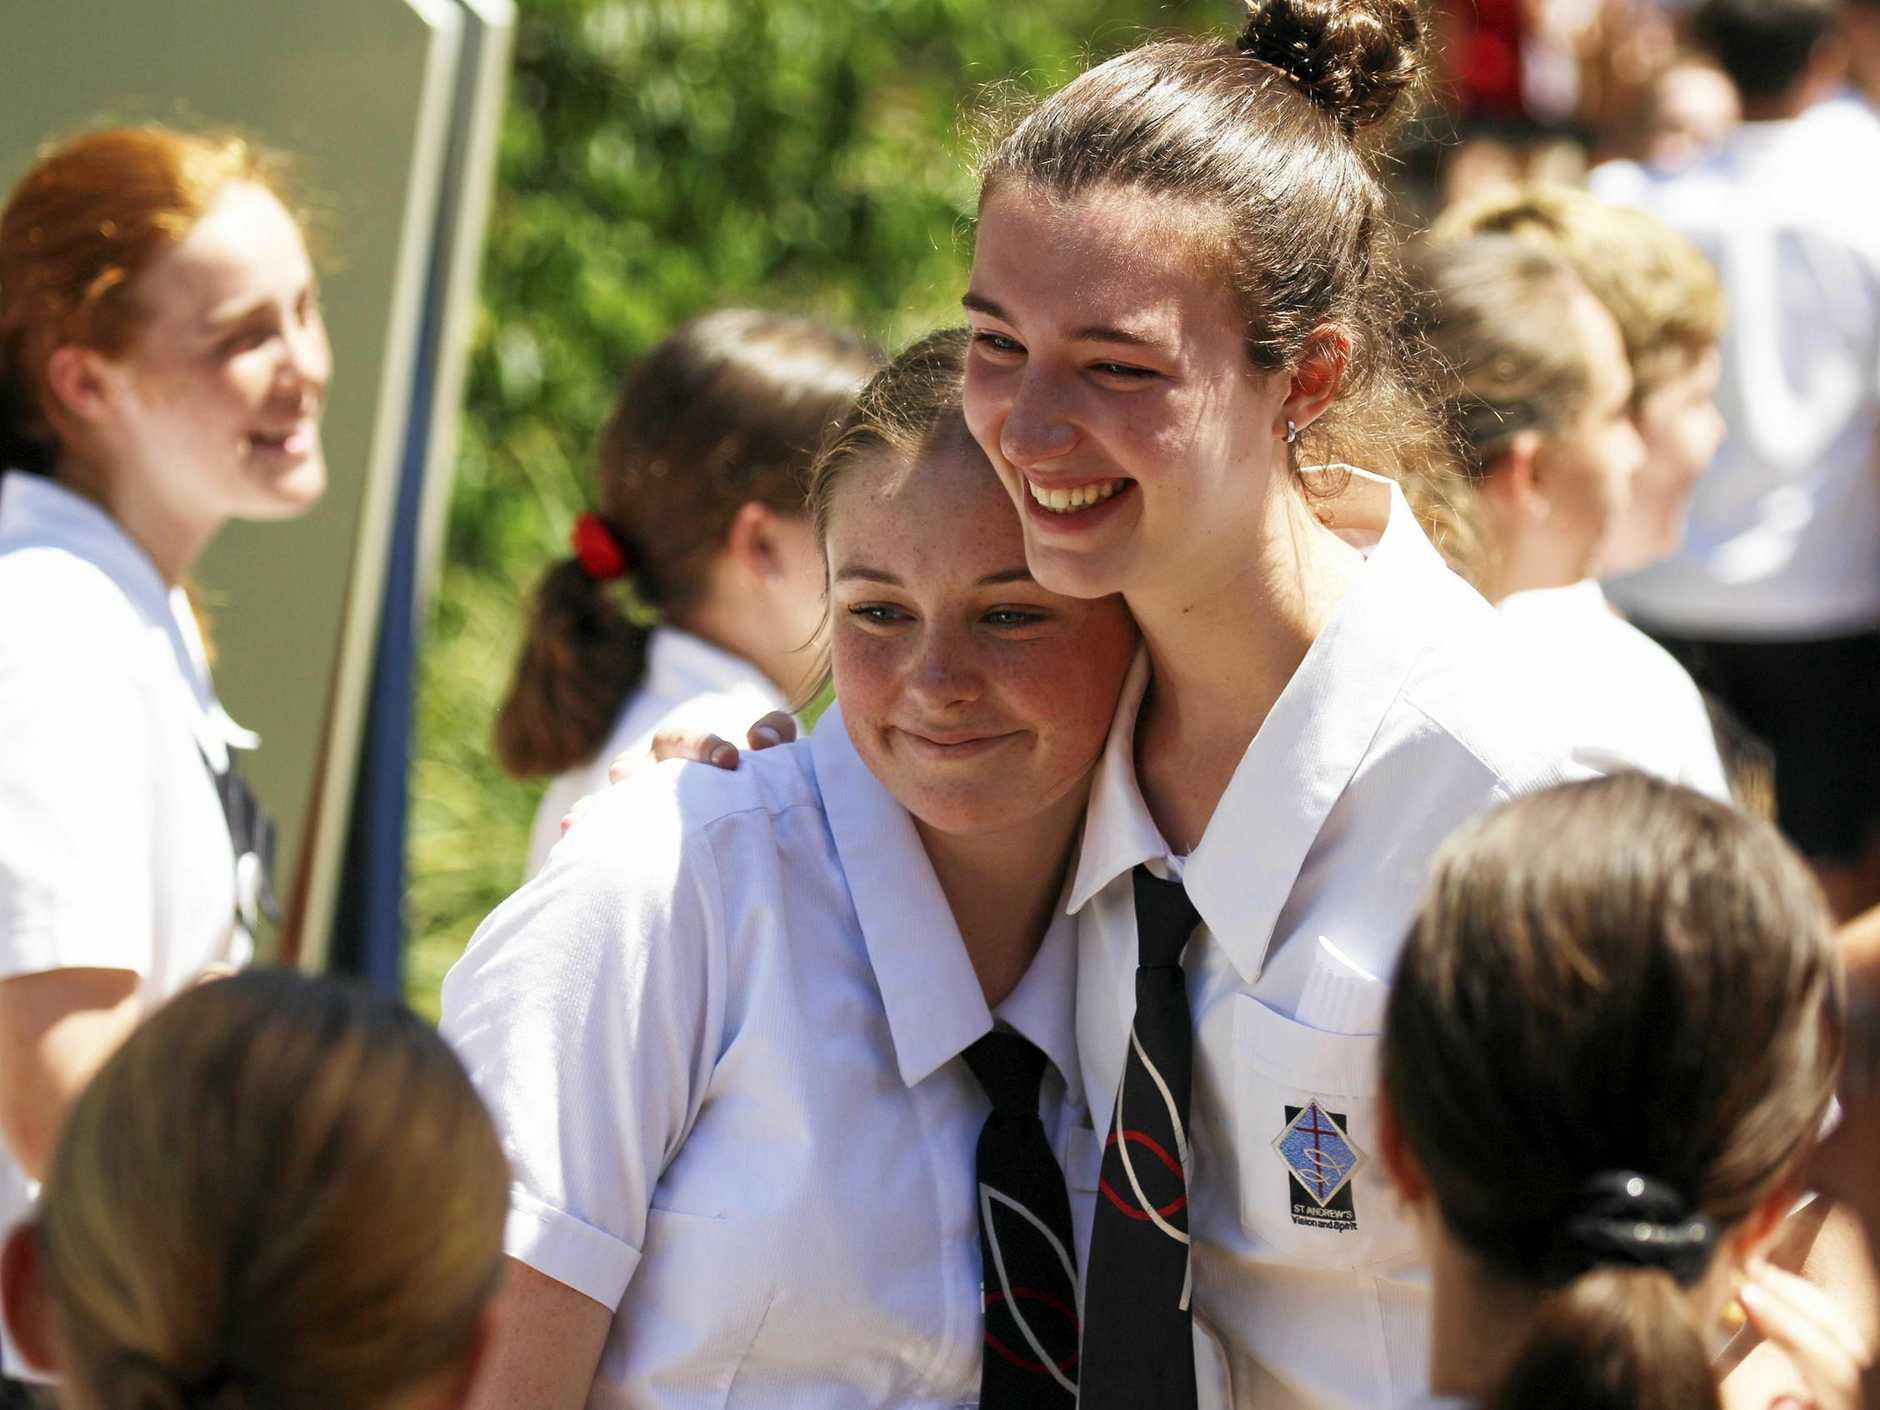 Graduates Jaimee Watson and Darcy Condon hugging in the guard of honour.